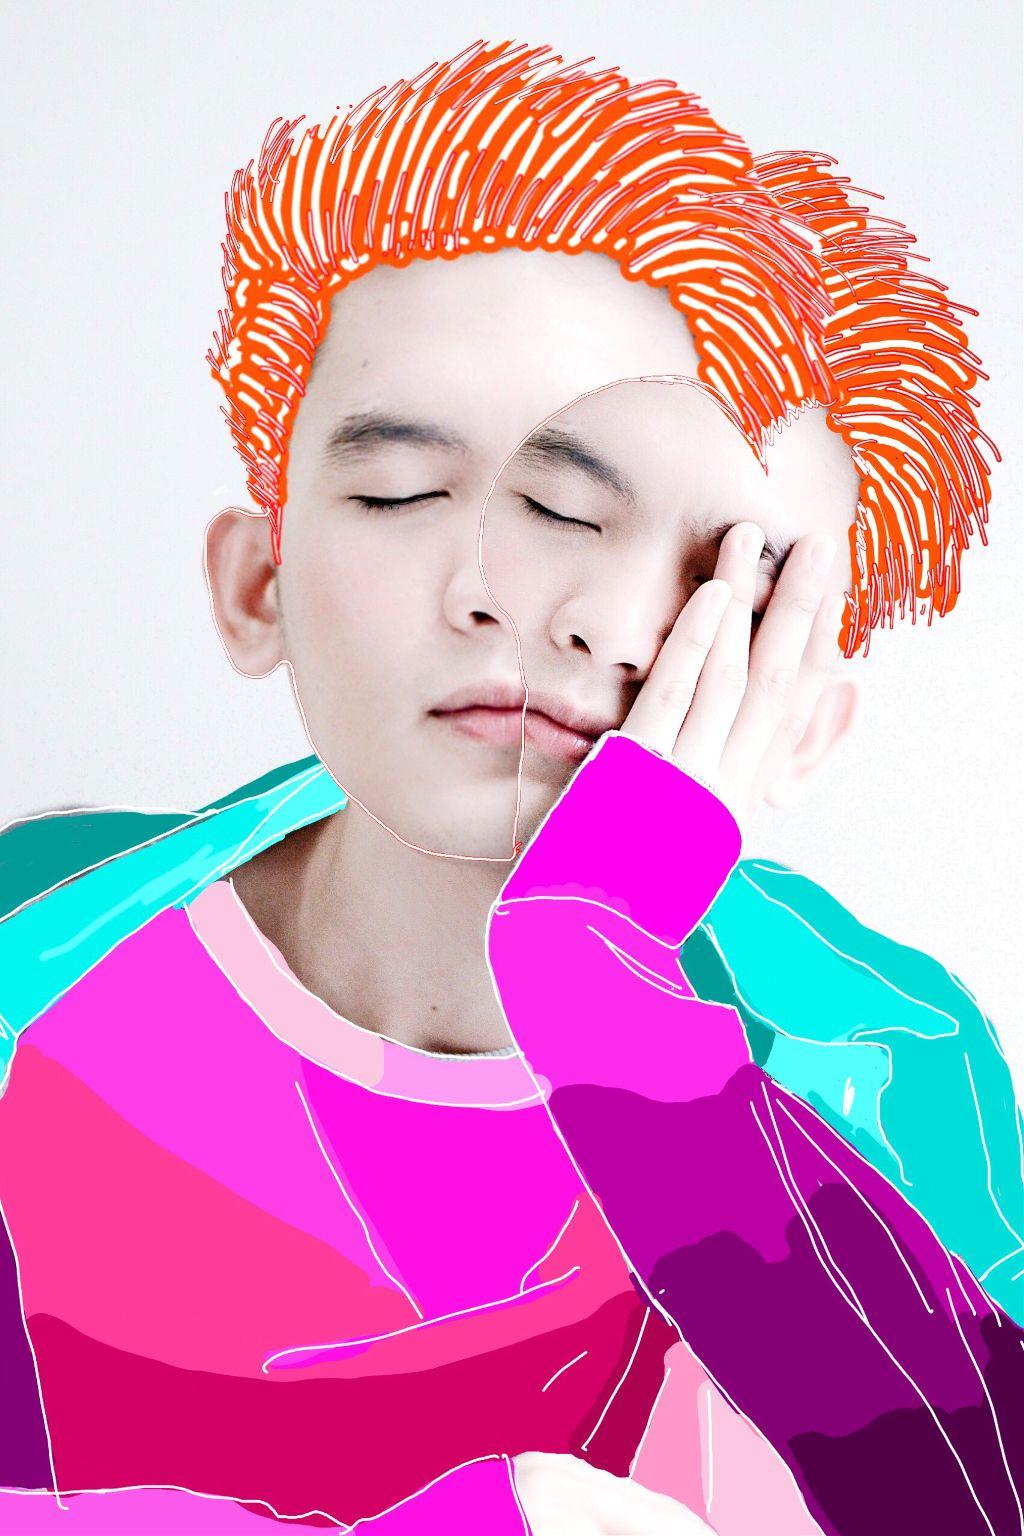 #freetoedit #freetoedit #edit #drawing #mydrawing #myedit #colorful #avantgarde #popart #remixit #remixed